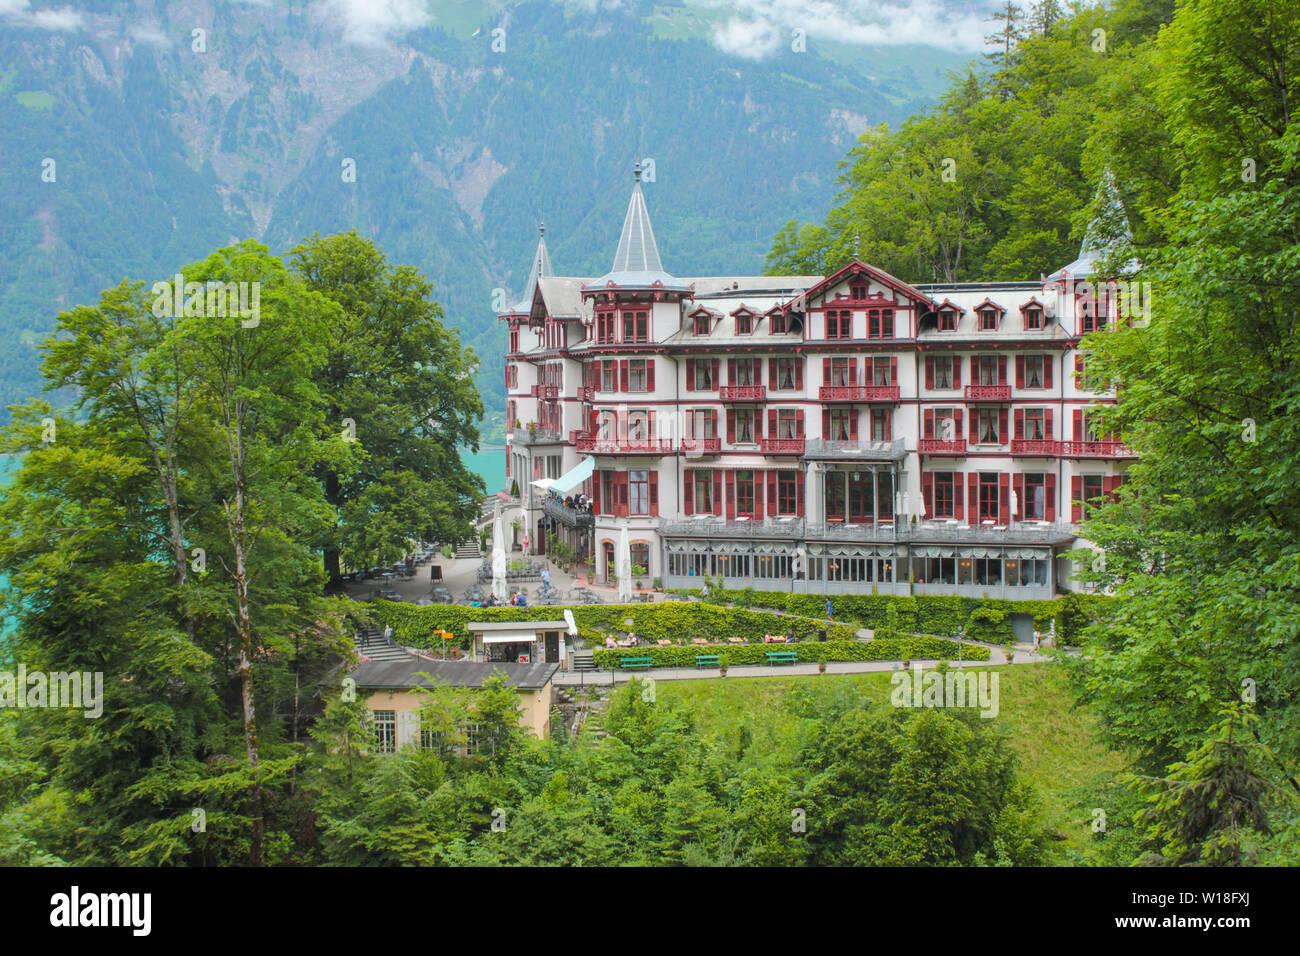 Historic hotel Hotel Giessbach, Switzerland. Stock Photo